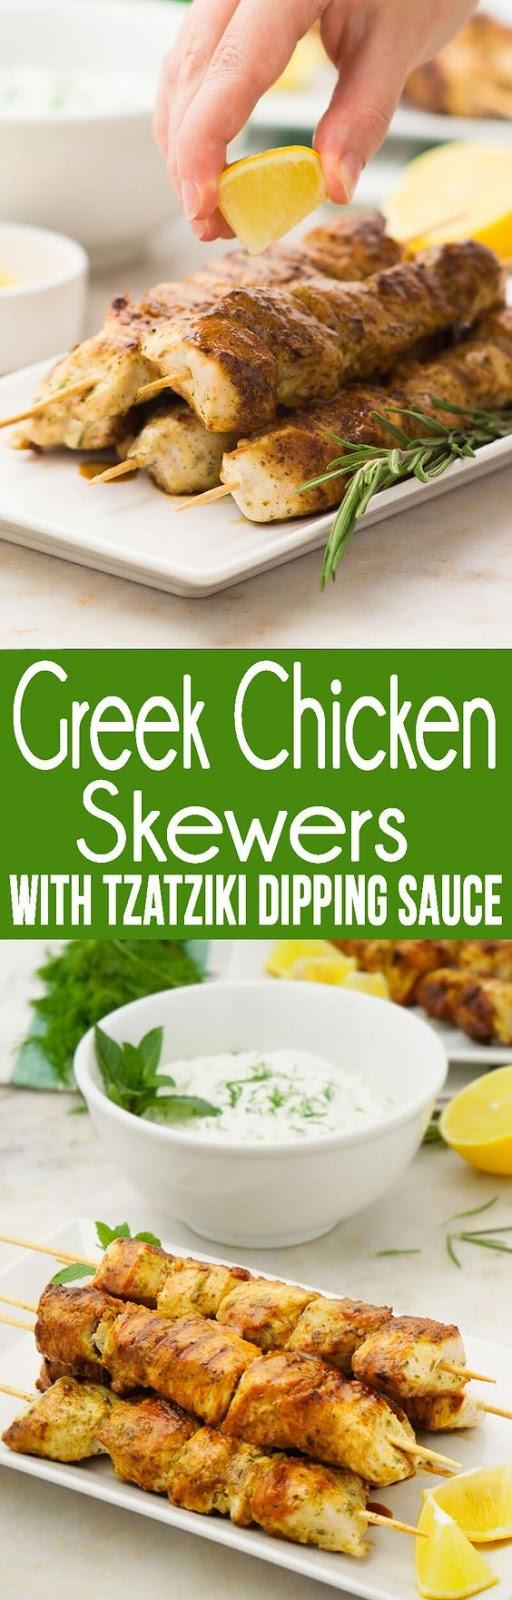 Greek Chicken Skewers With Tzatziki Dipping Sauce